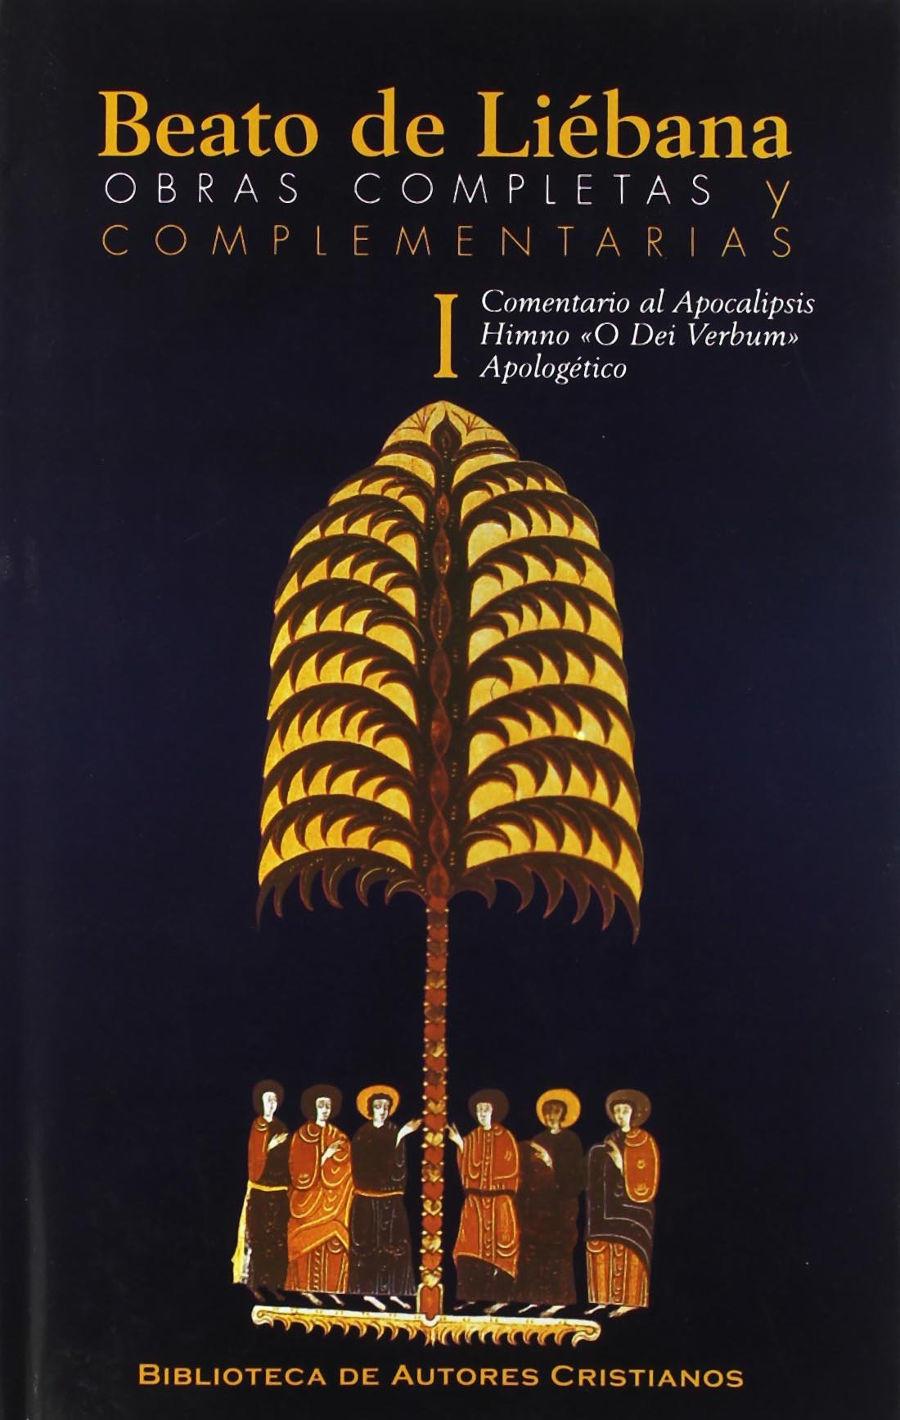 Obras completas y complementarias de Beato de Liébana. I: Comentario al Apocalipsis, Himno O Dei Verbum, Apologético Book Cover